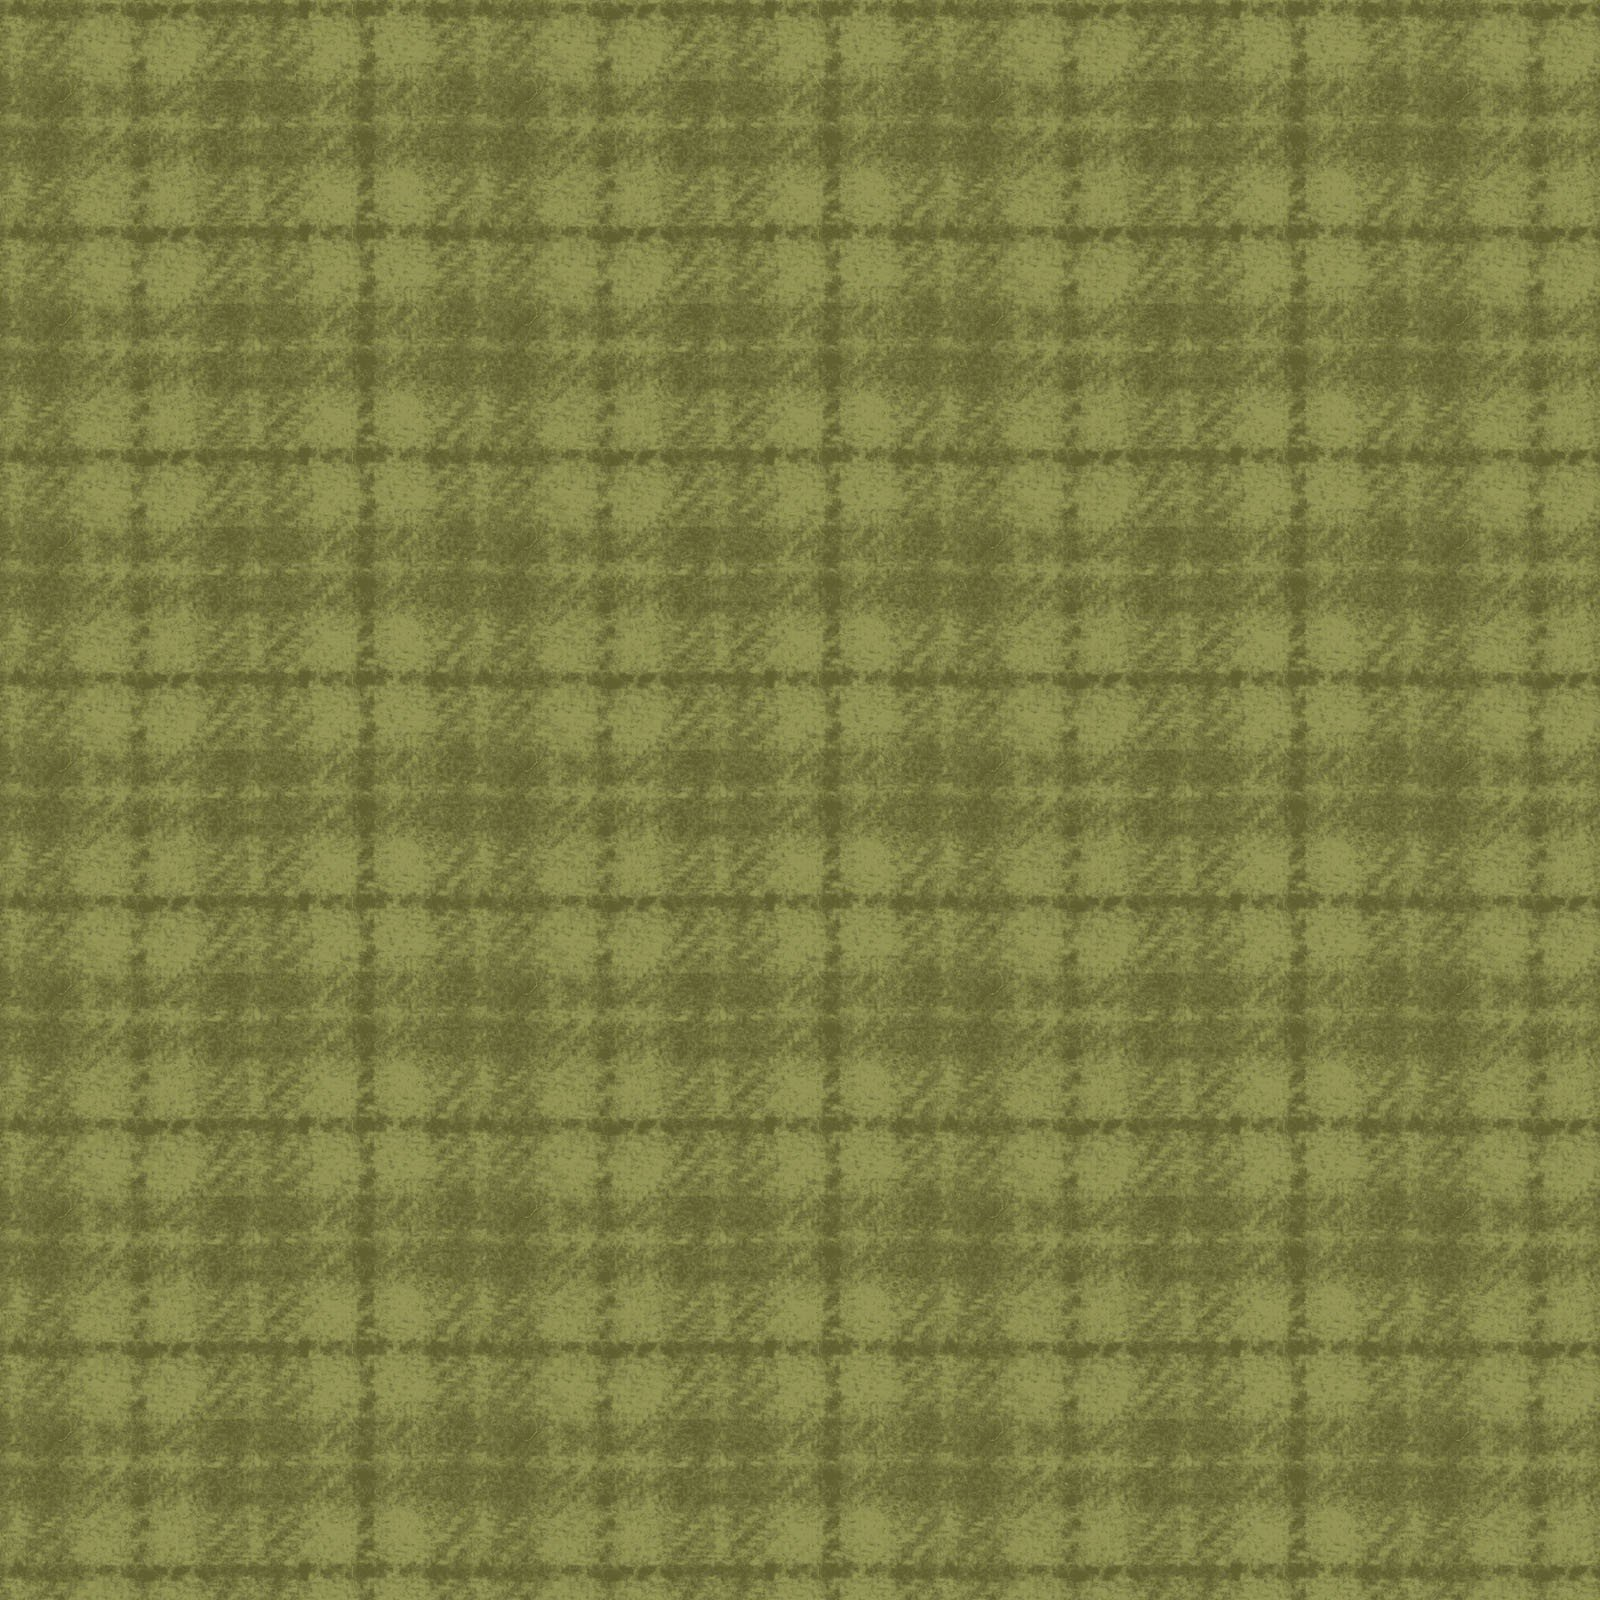 Woolies Flannel Plaid Green (MASF18502-G)